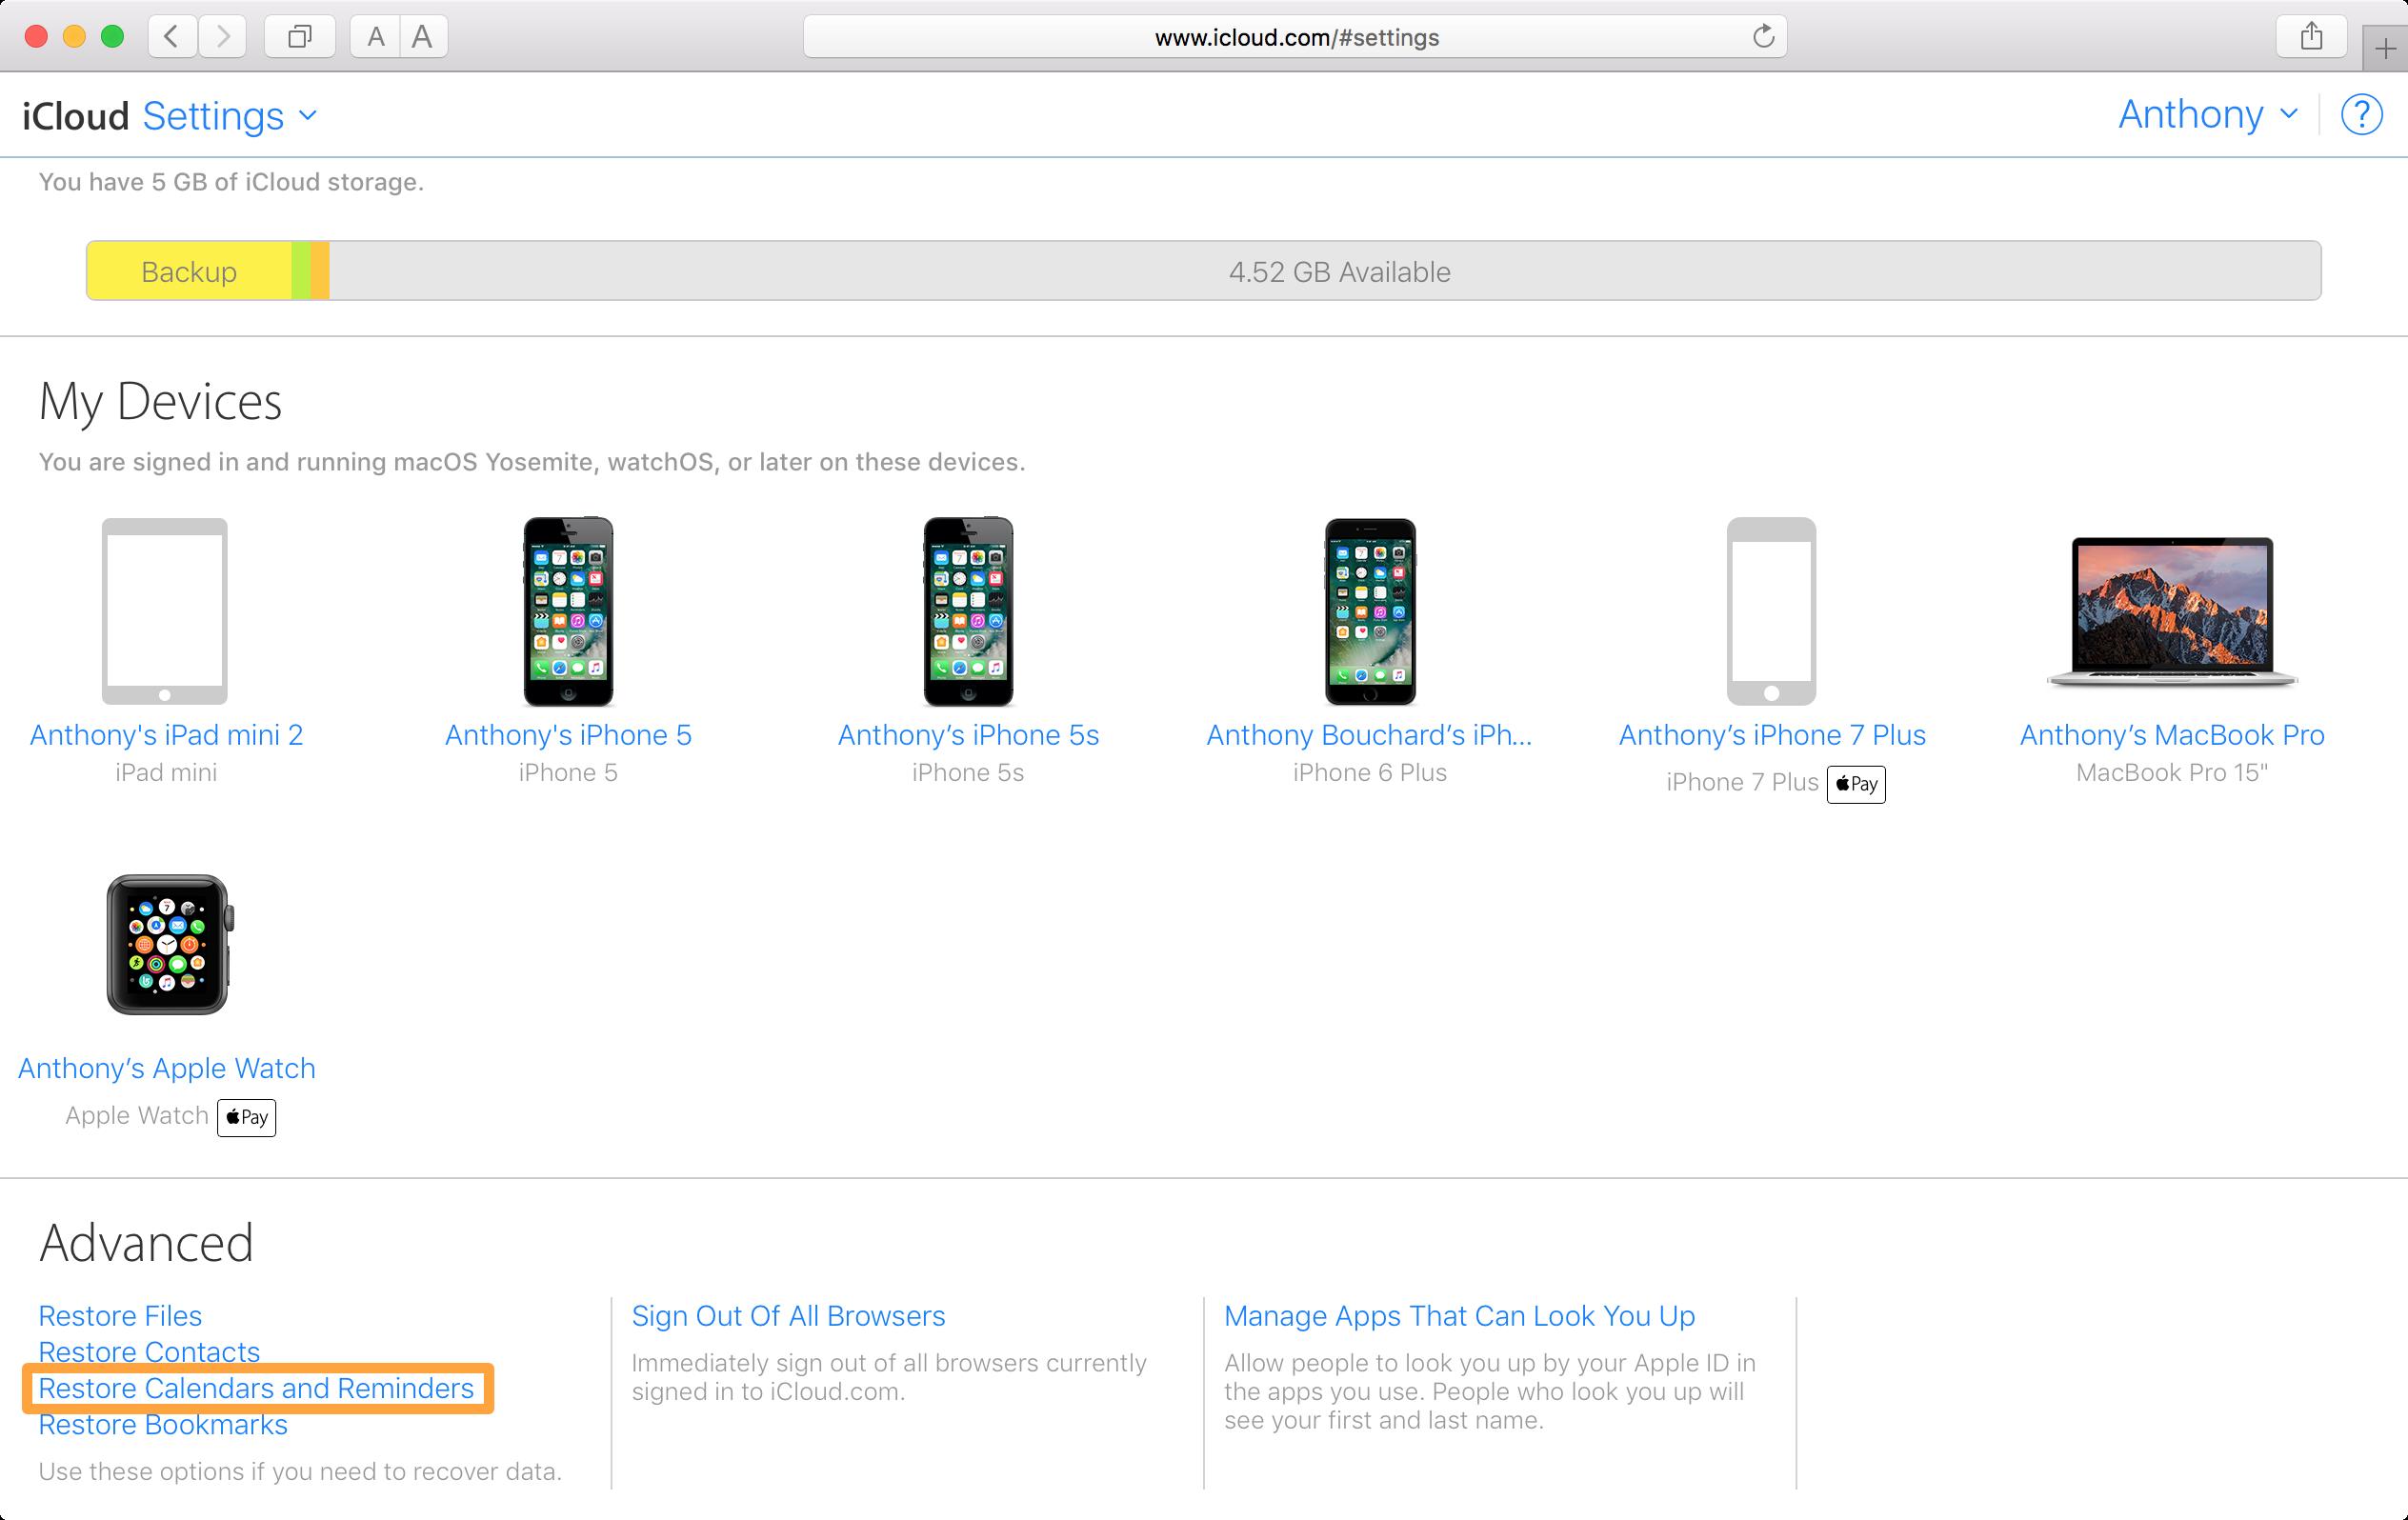 iCloud Restore Calendars and Reminders